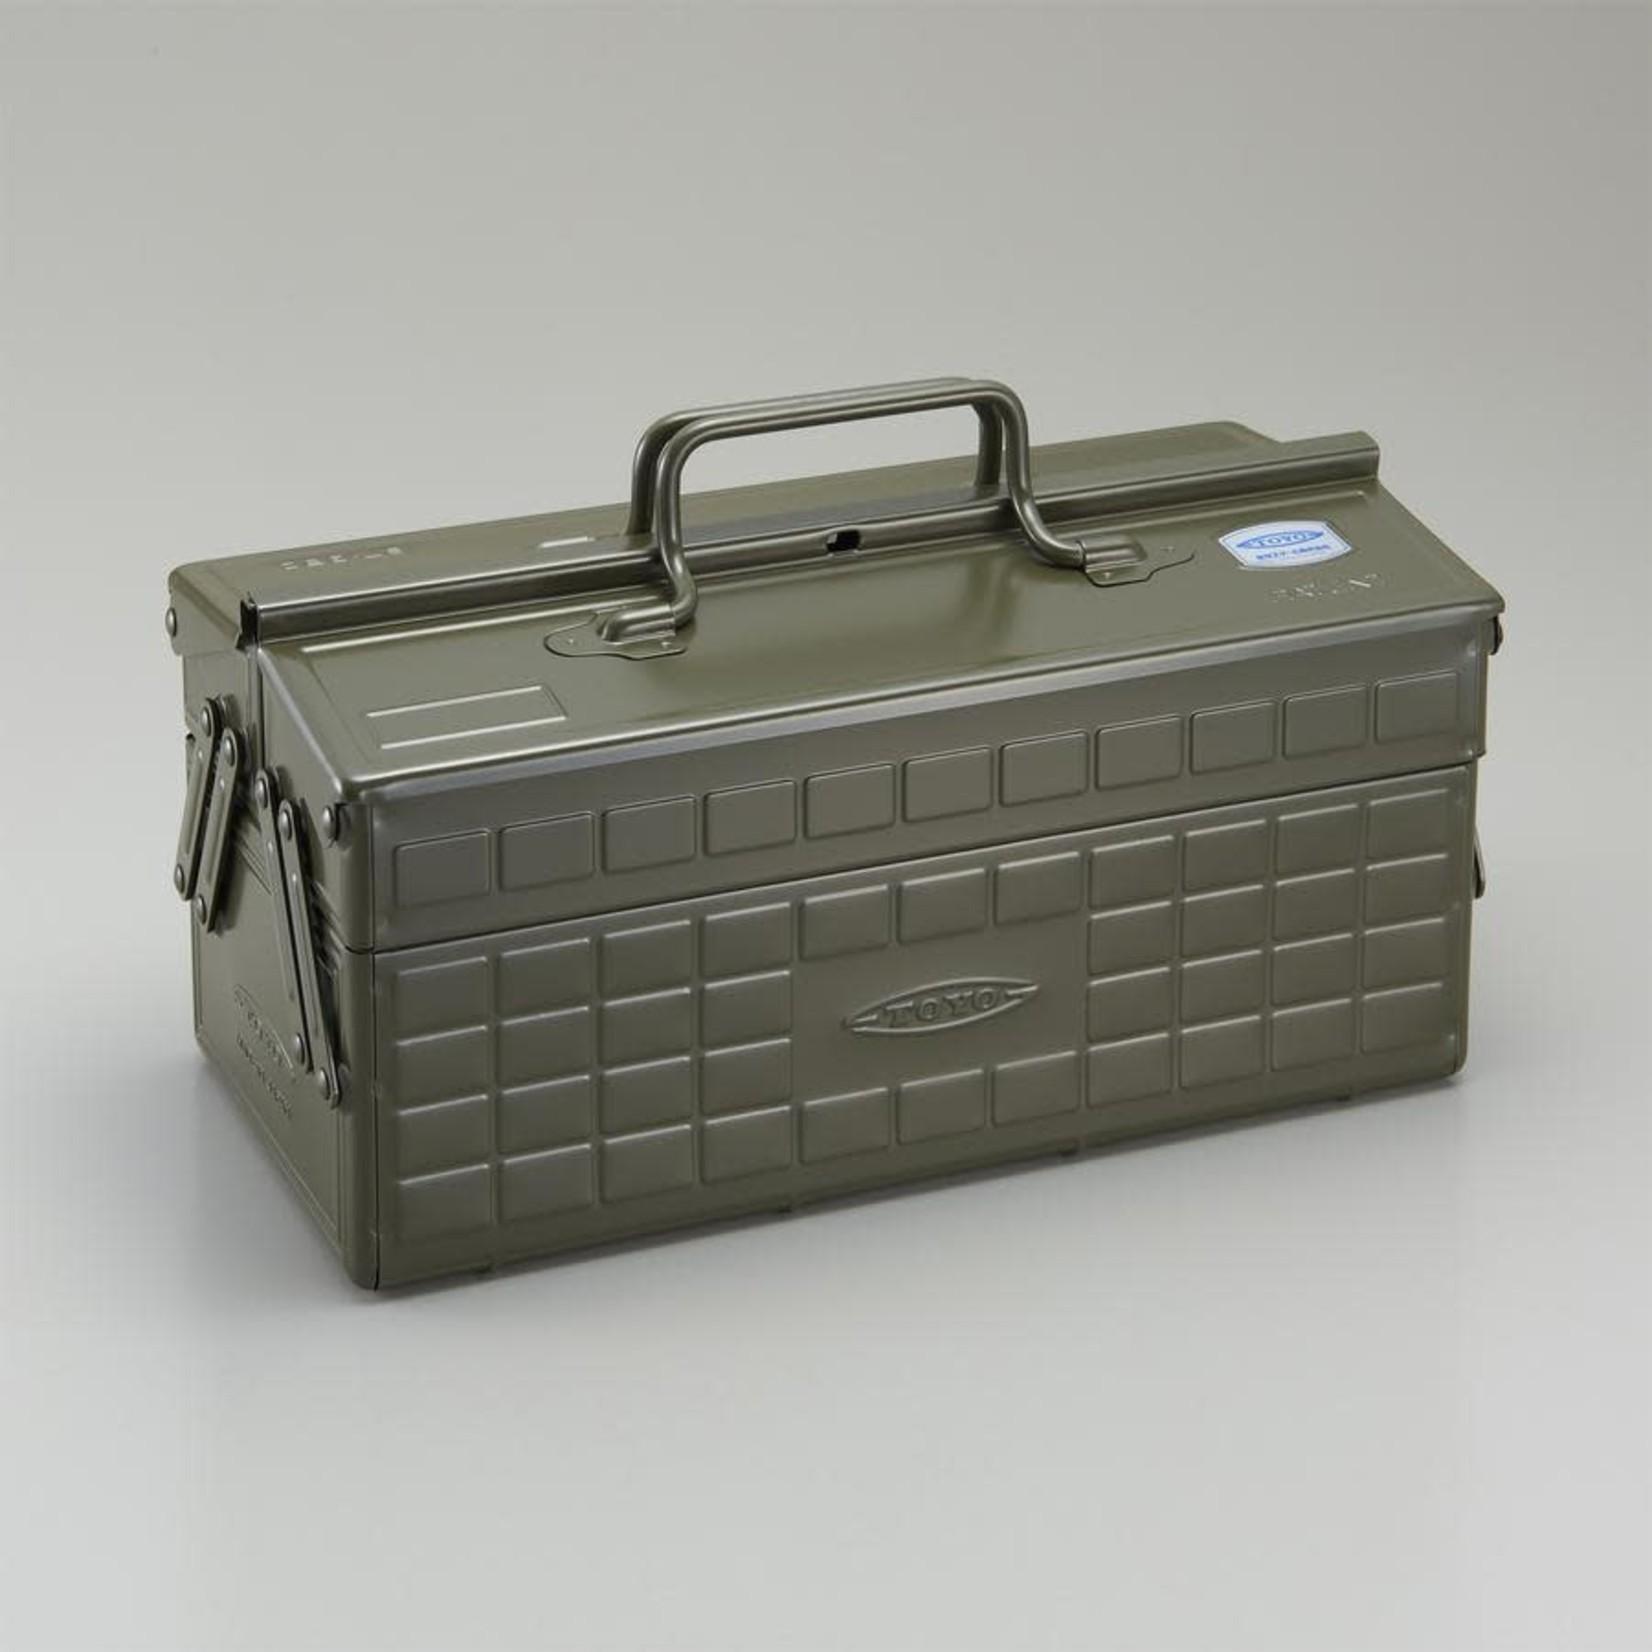 Toyo Toyo Steel Toolbox ST350 Military Green